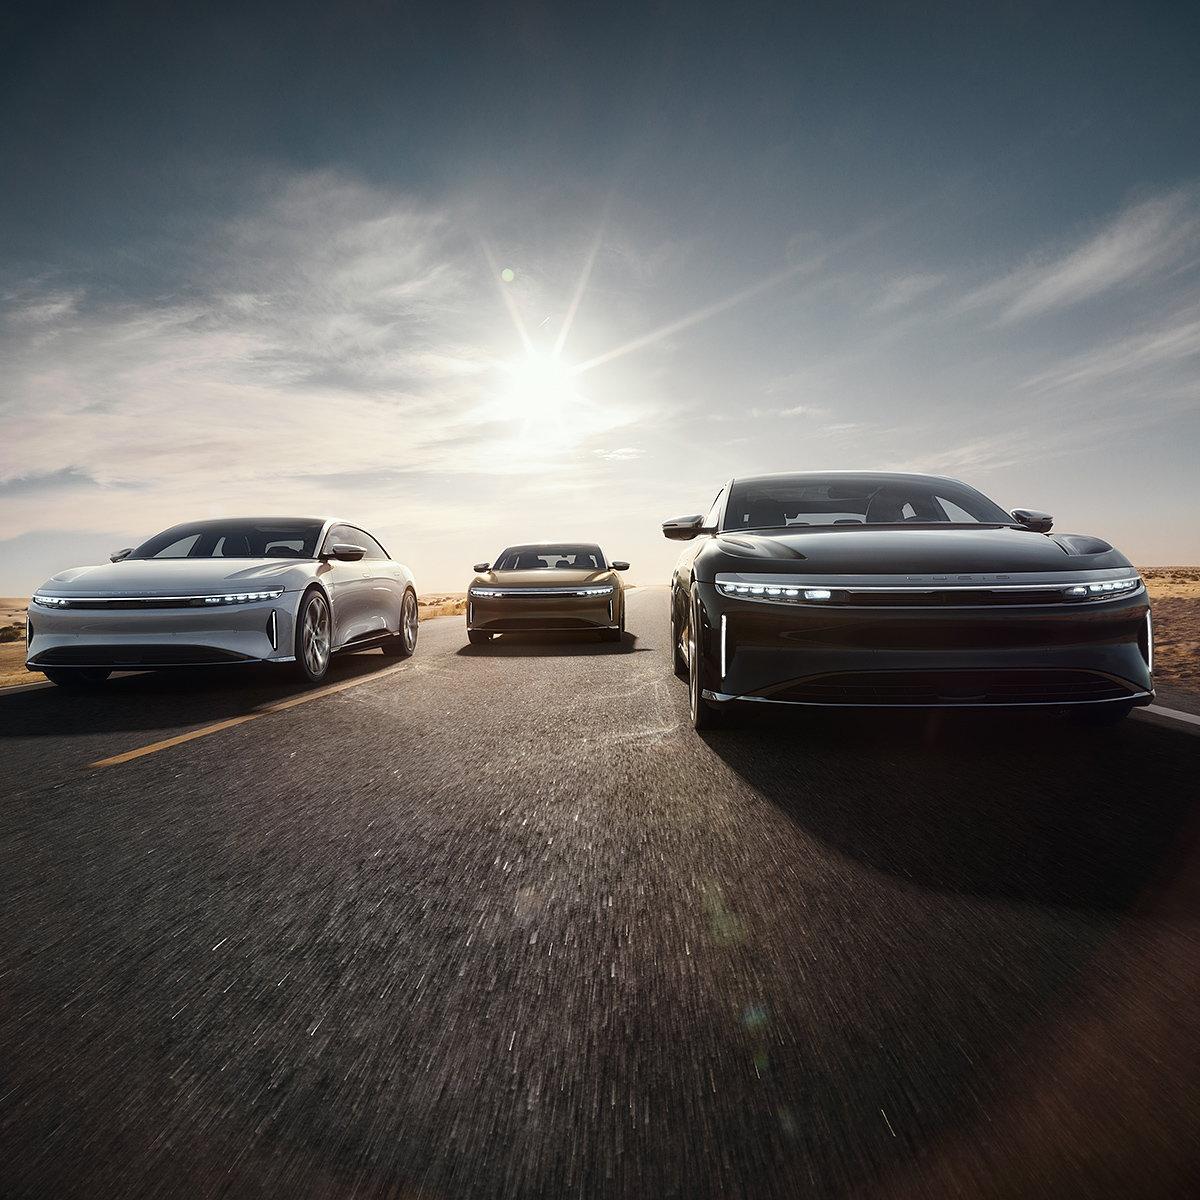 Good Design Award Names Lucid Air 'Best Car Design for 2020'